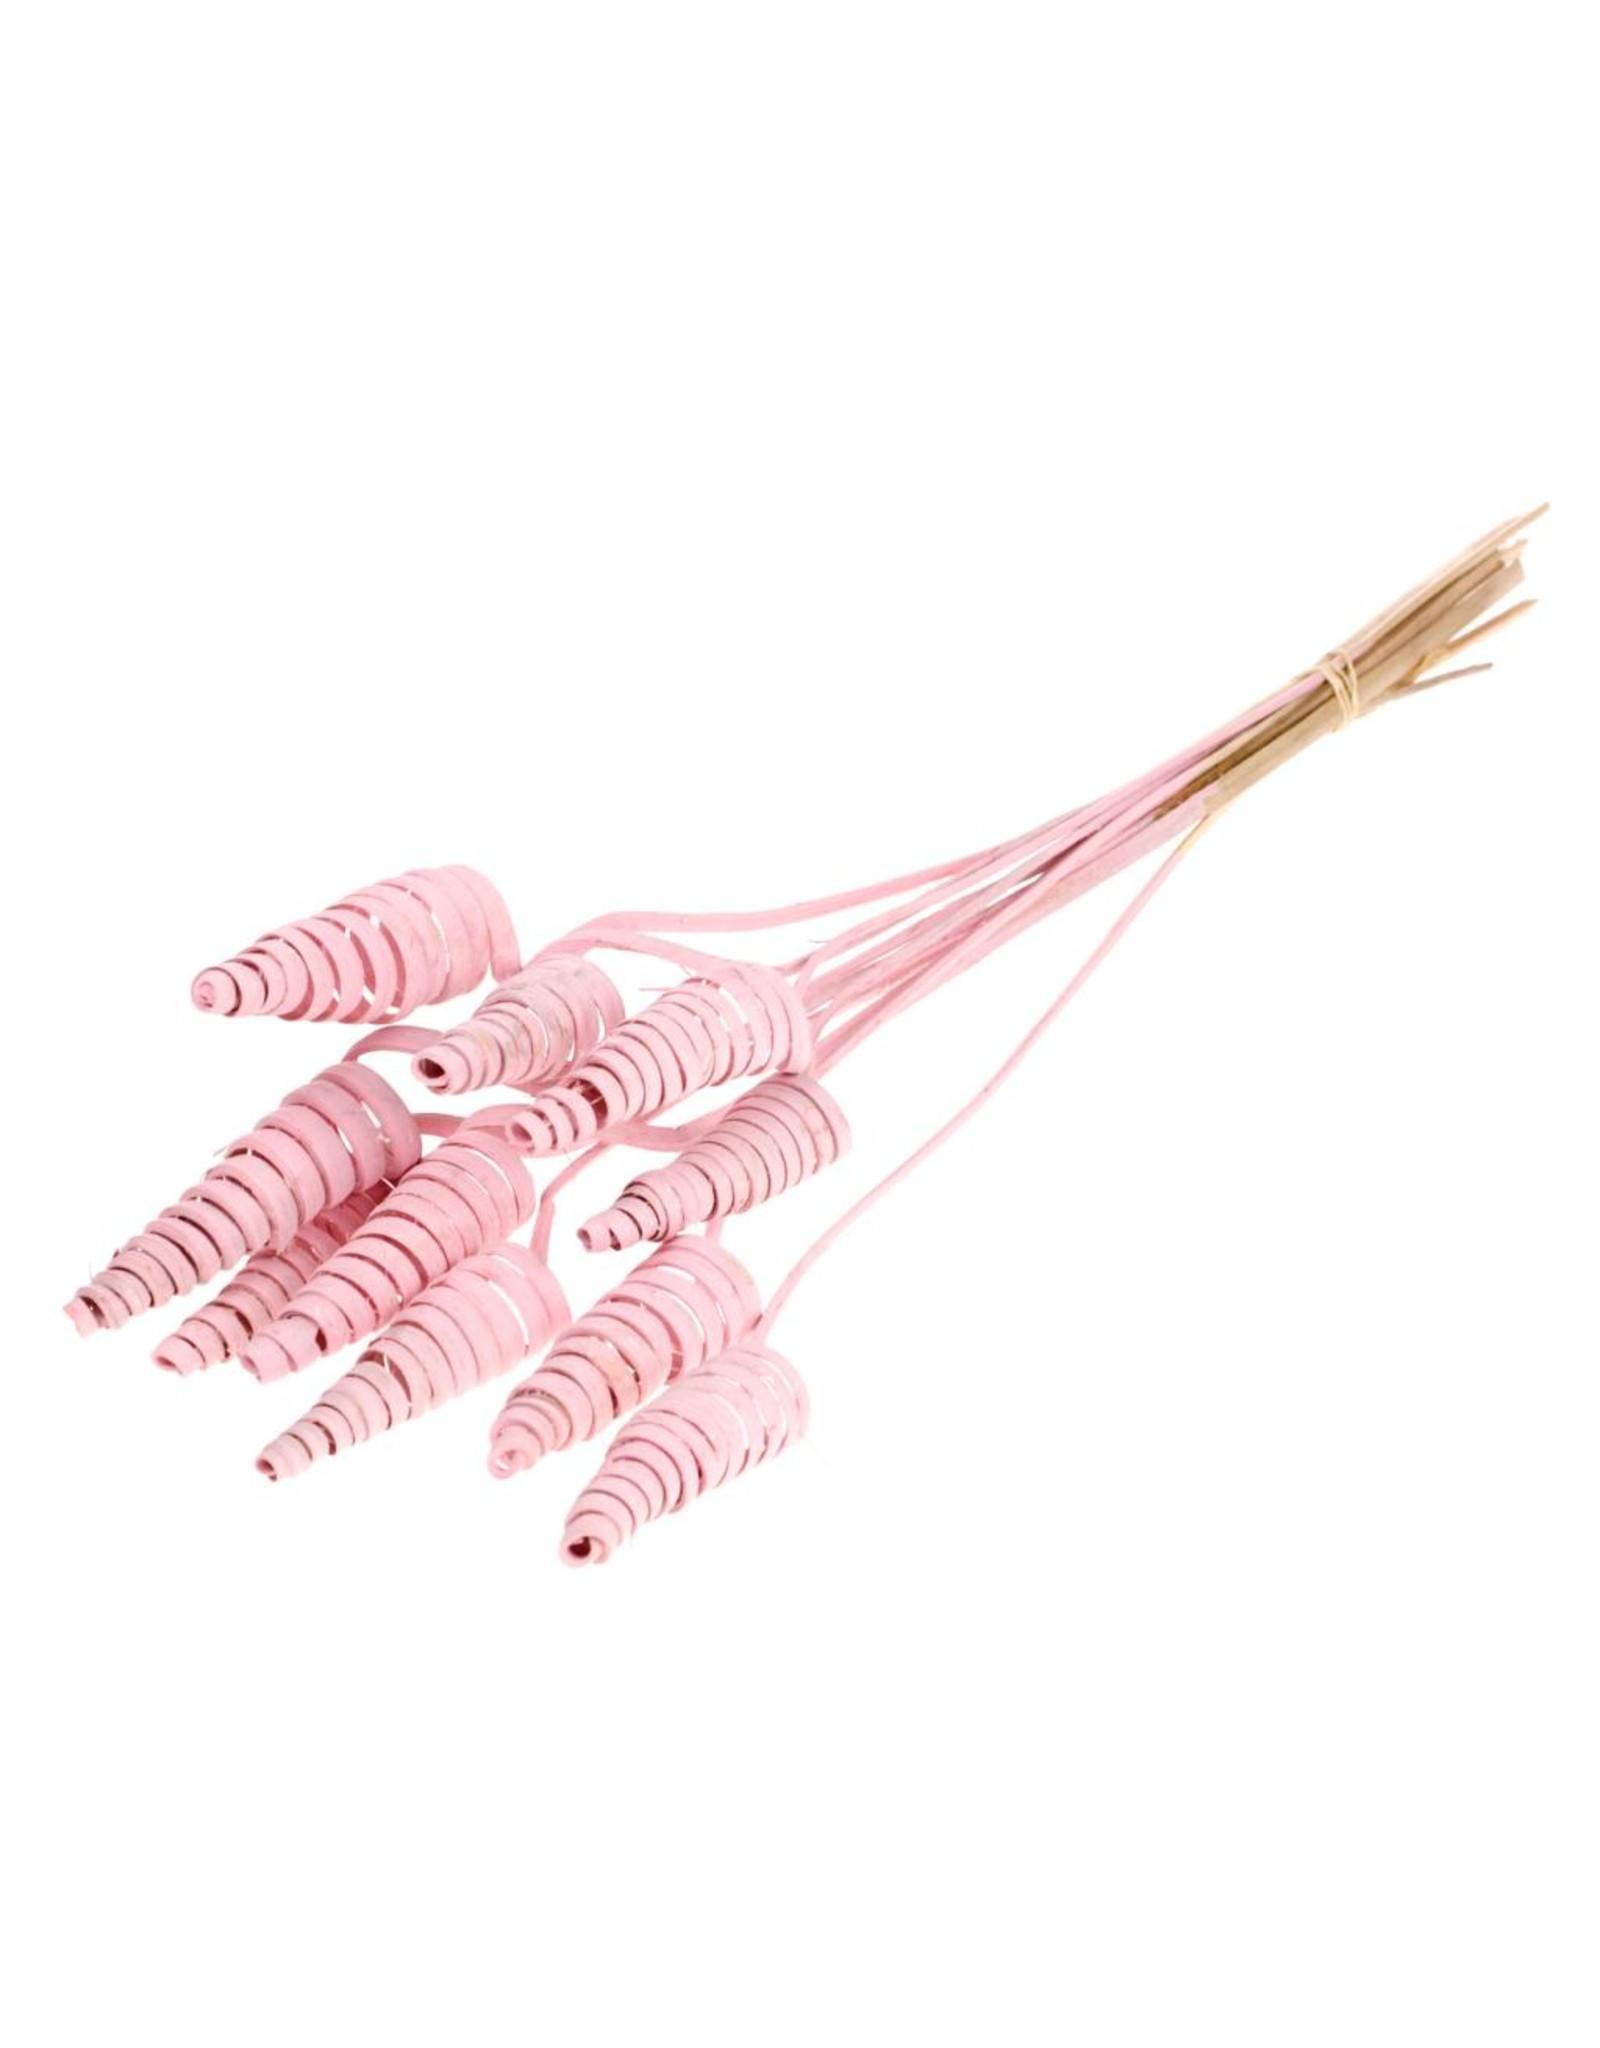 Cane cone pink misty x 30